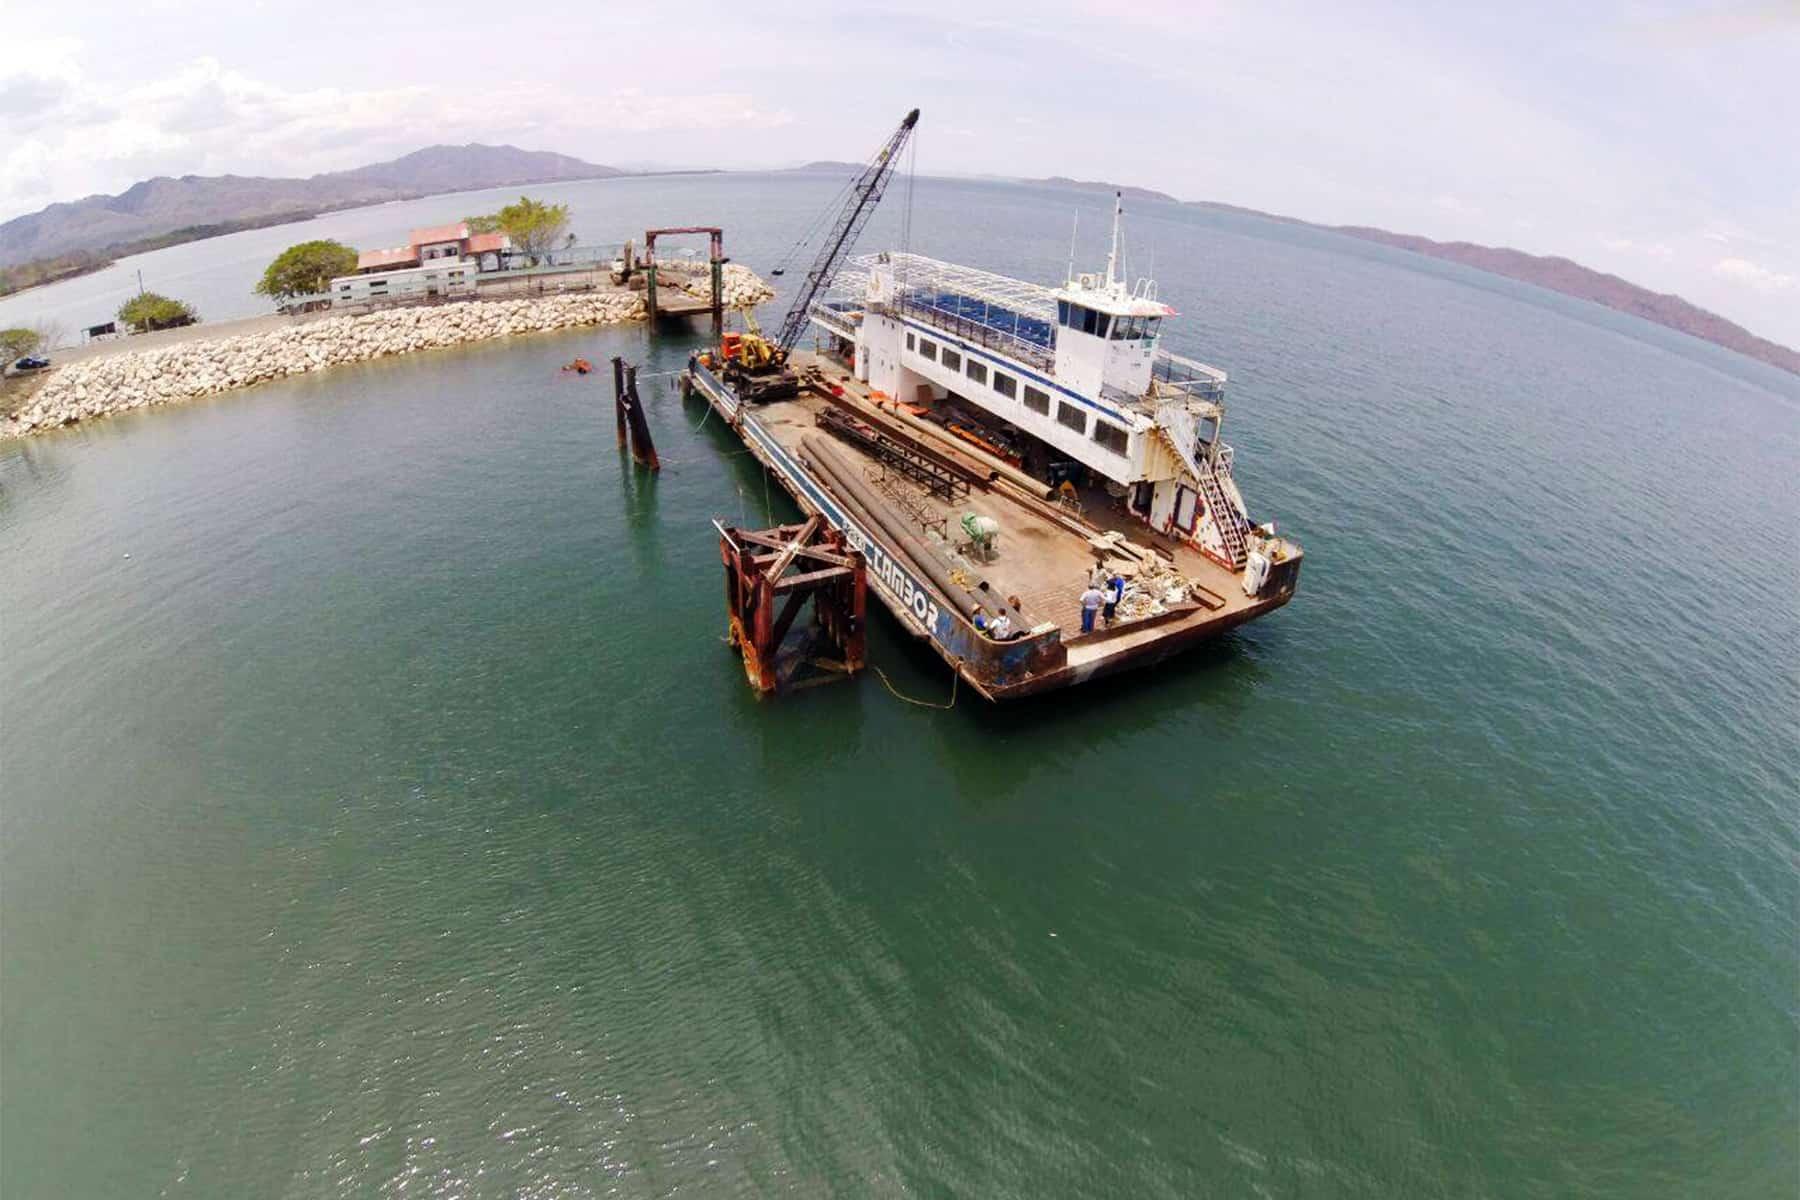 Ferry dock at Playa Naranjo